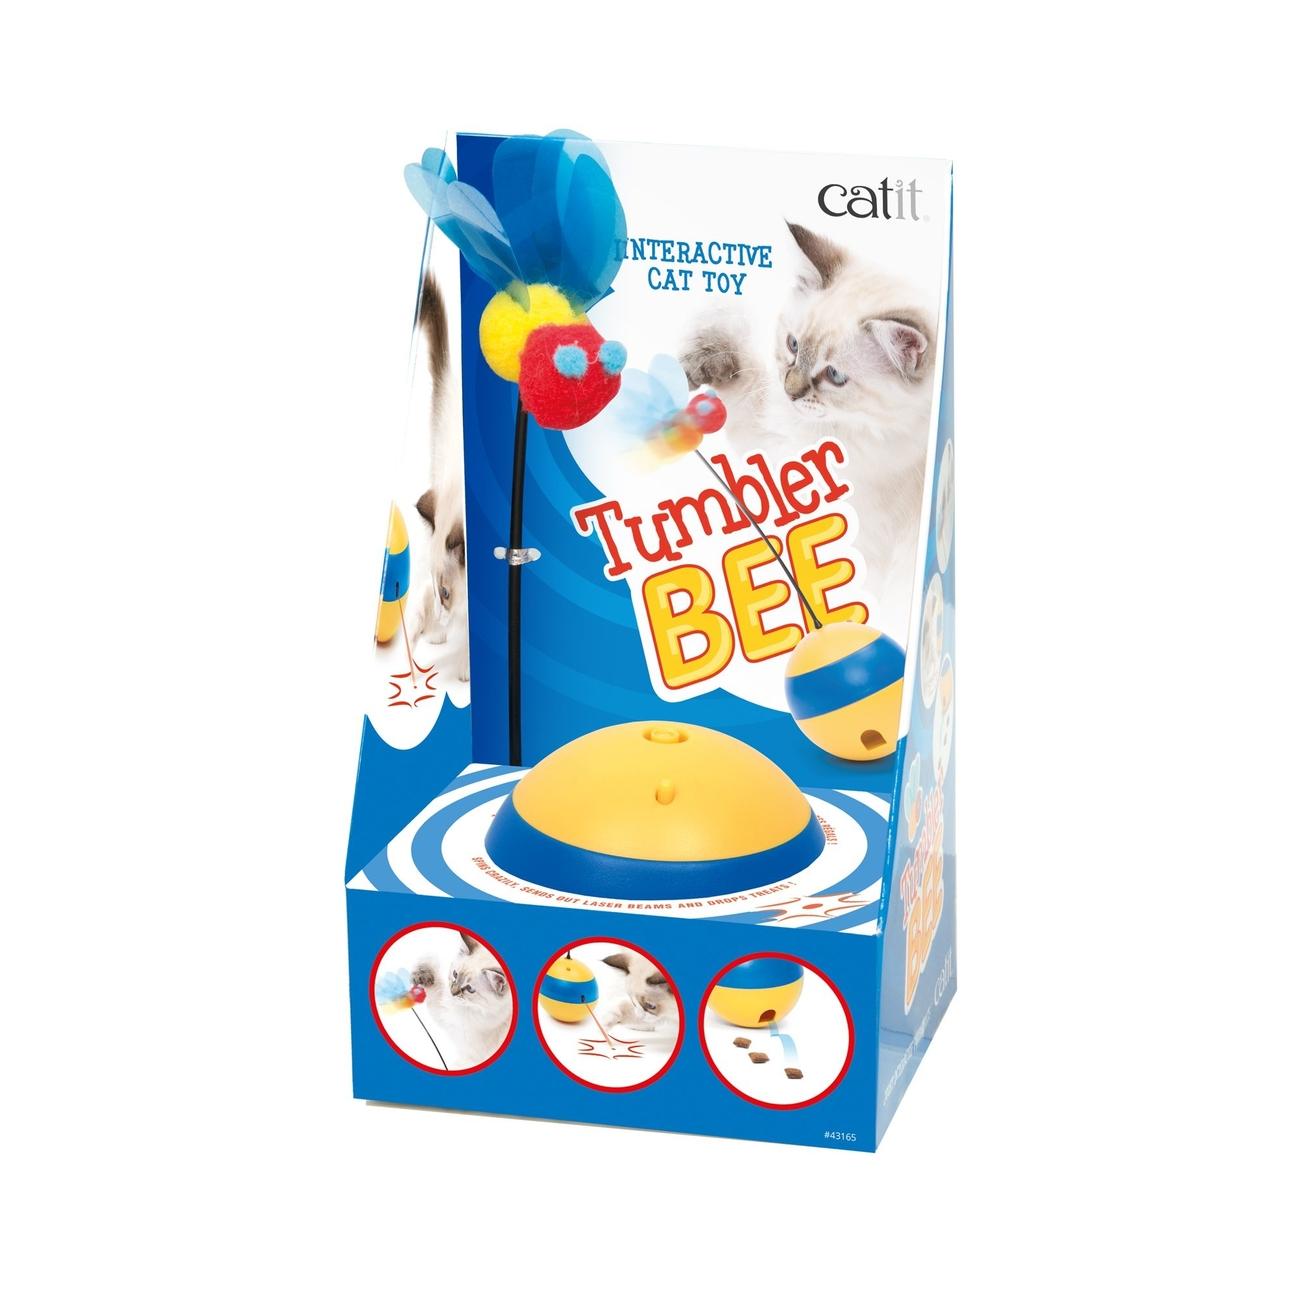 Catit Play 2.0 Tumbler Bee Laserspielzeug, Bild 2